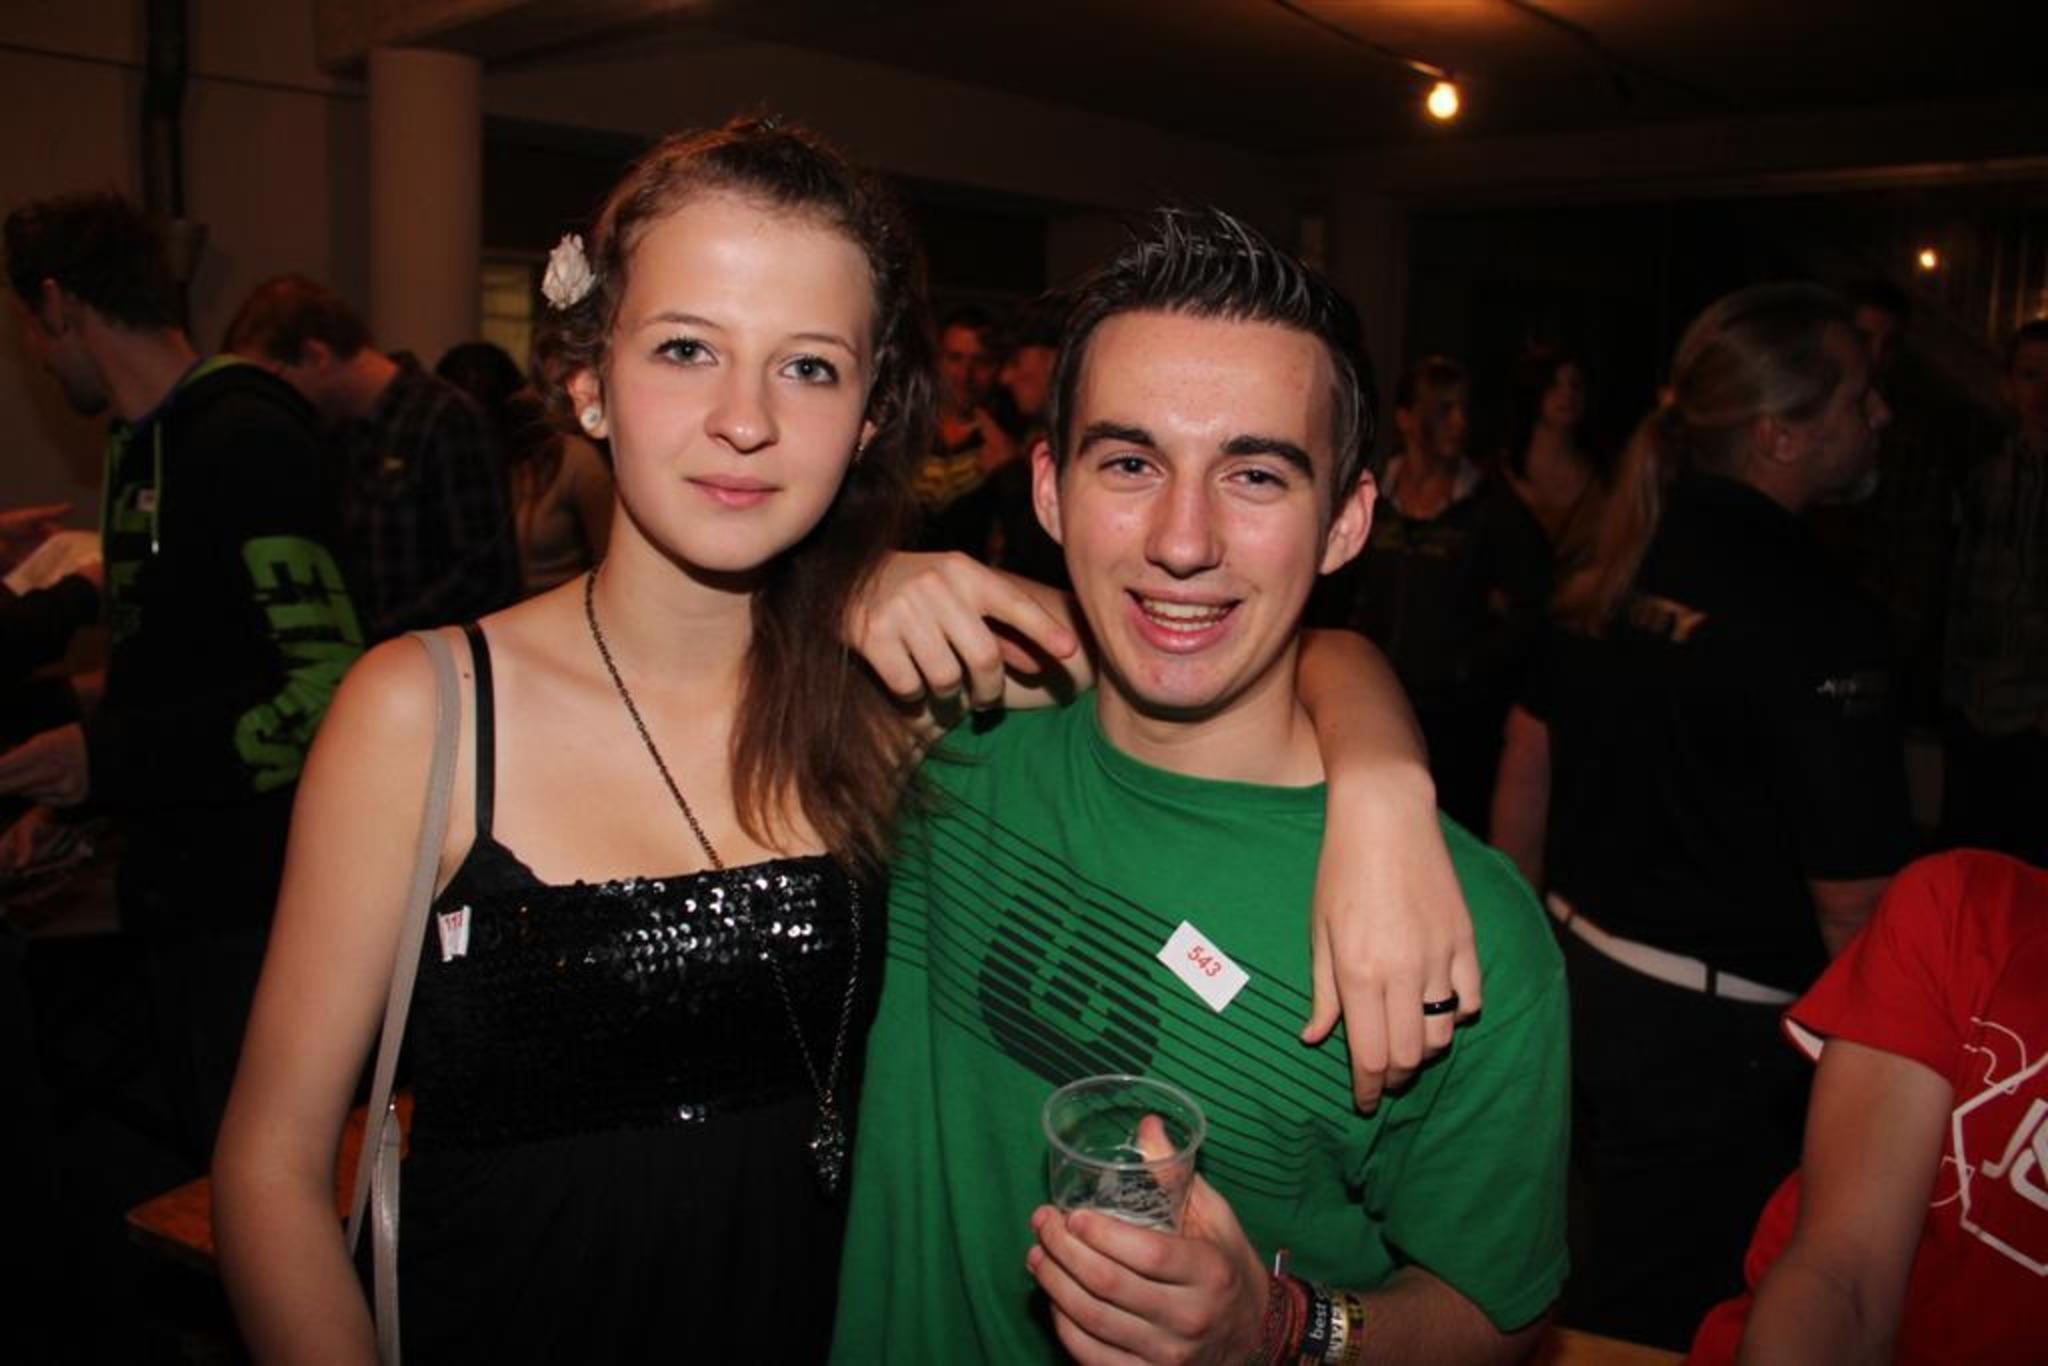 Bad bleiberg leute aus kennenlernen - Bekanntschaften